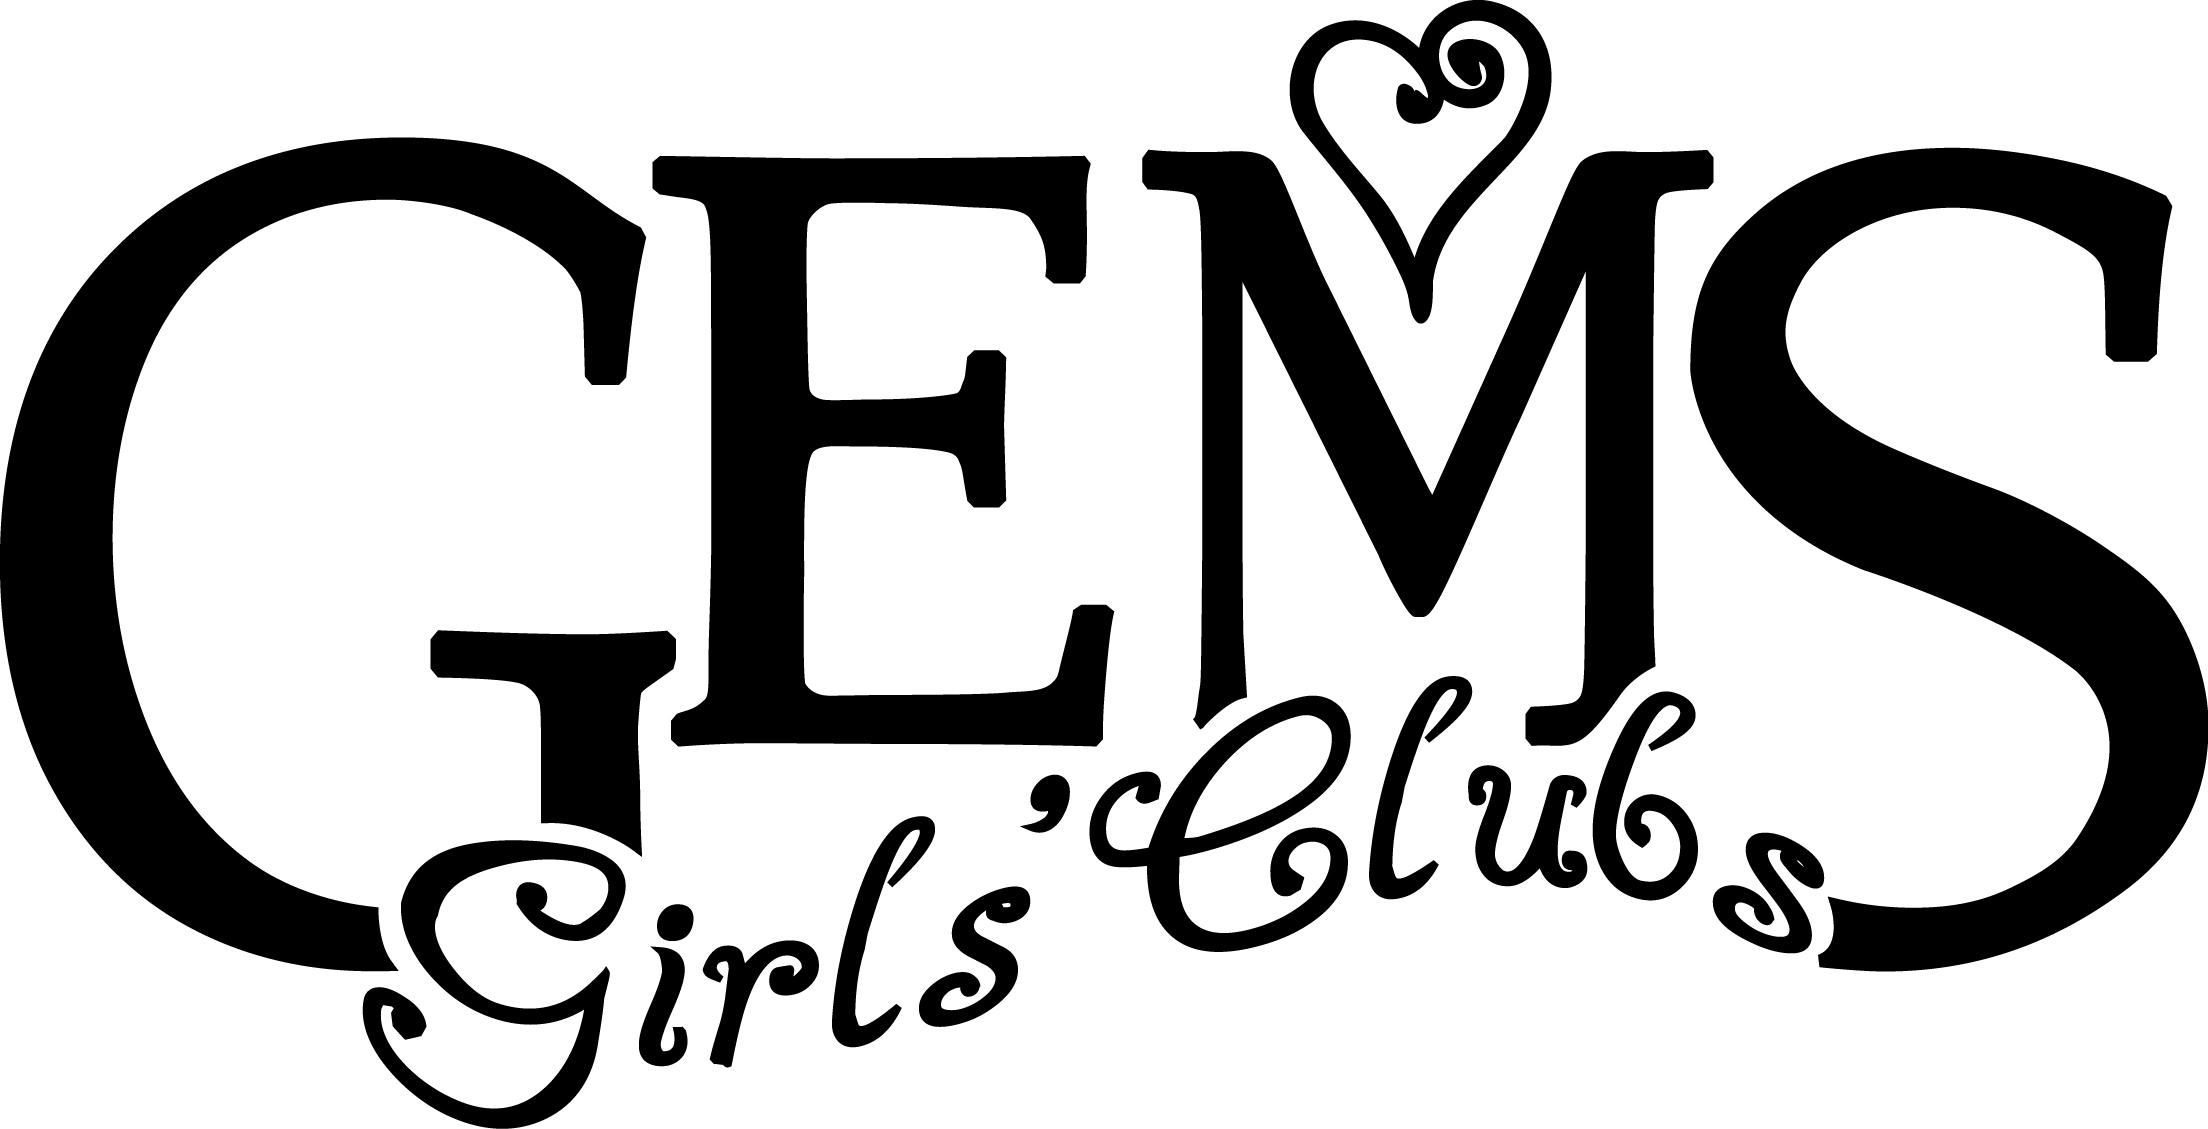 Gems clipart logo Logo_GEMS_k Art Clip GEMS